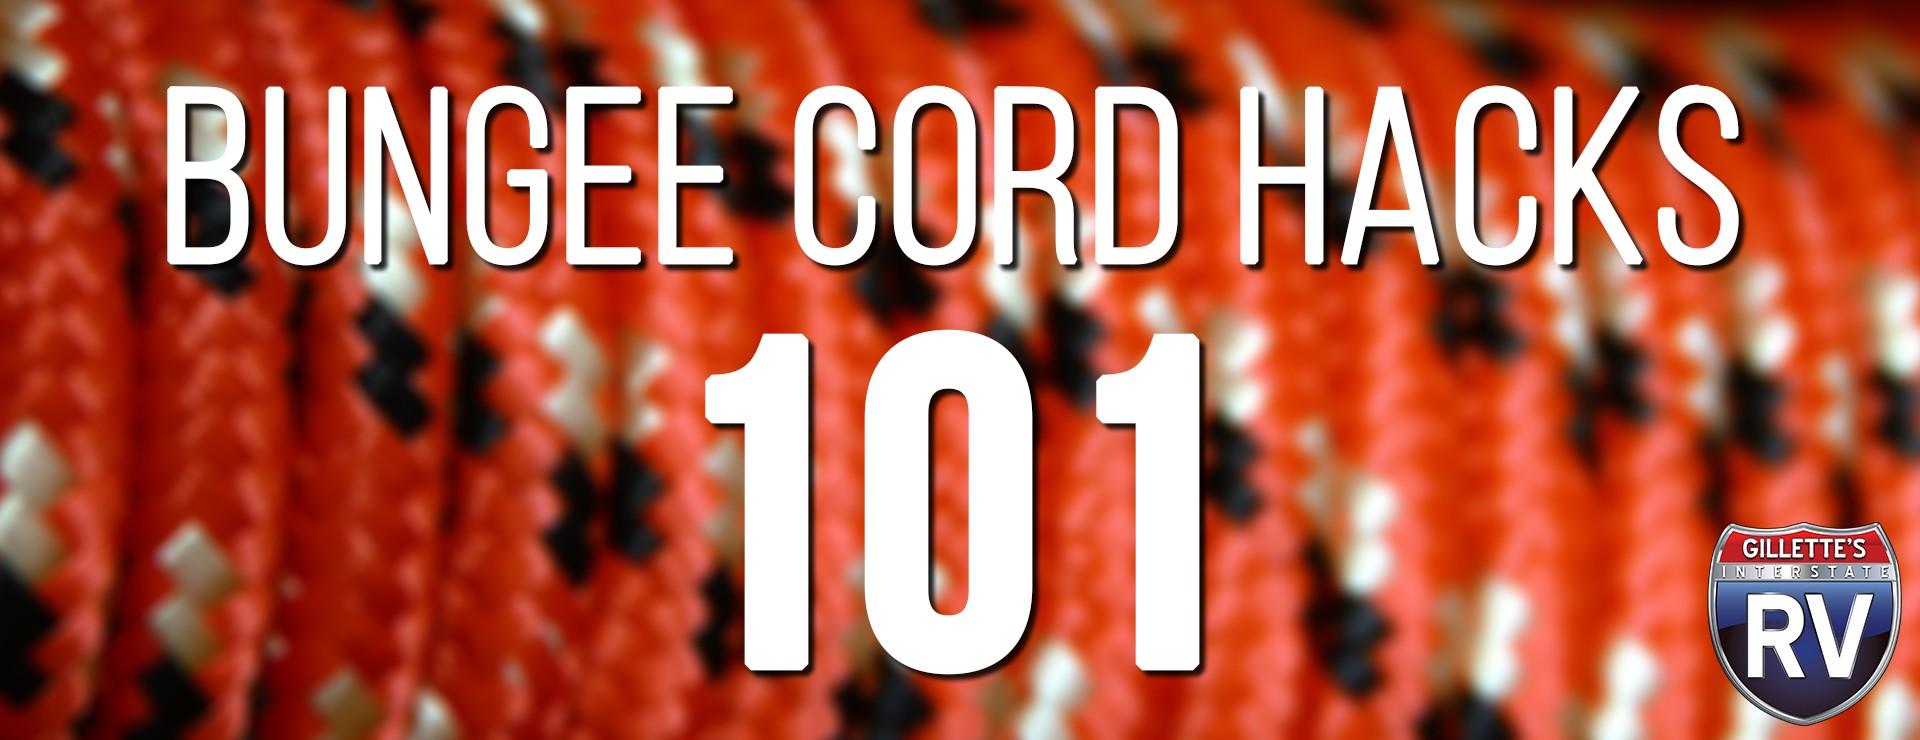 budget cord hacks 101